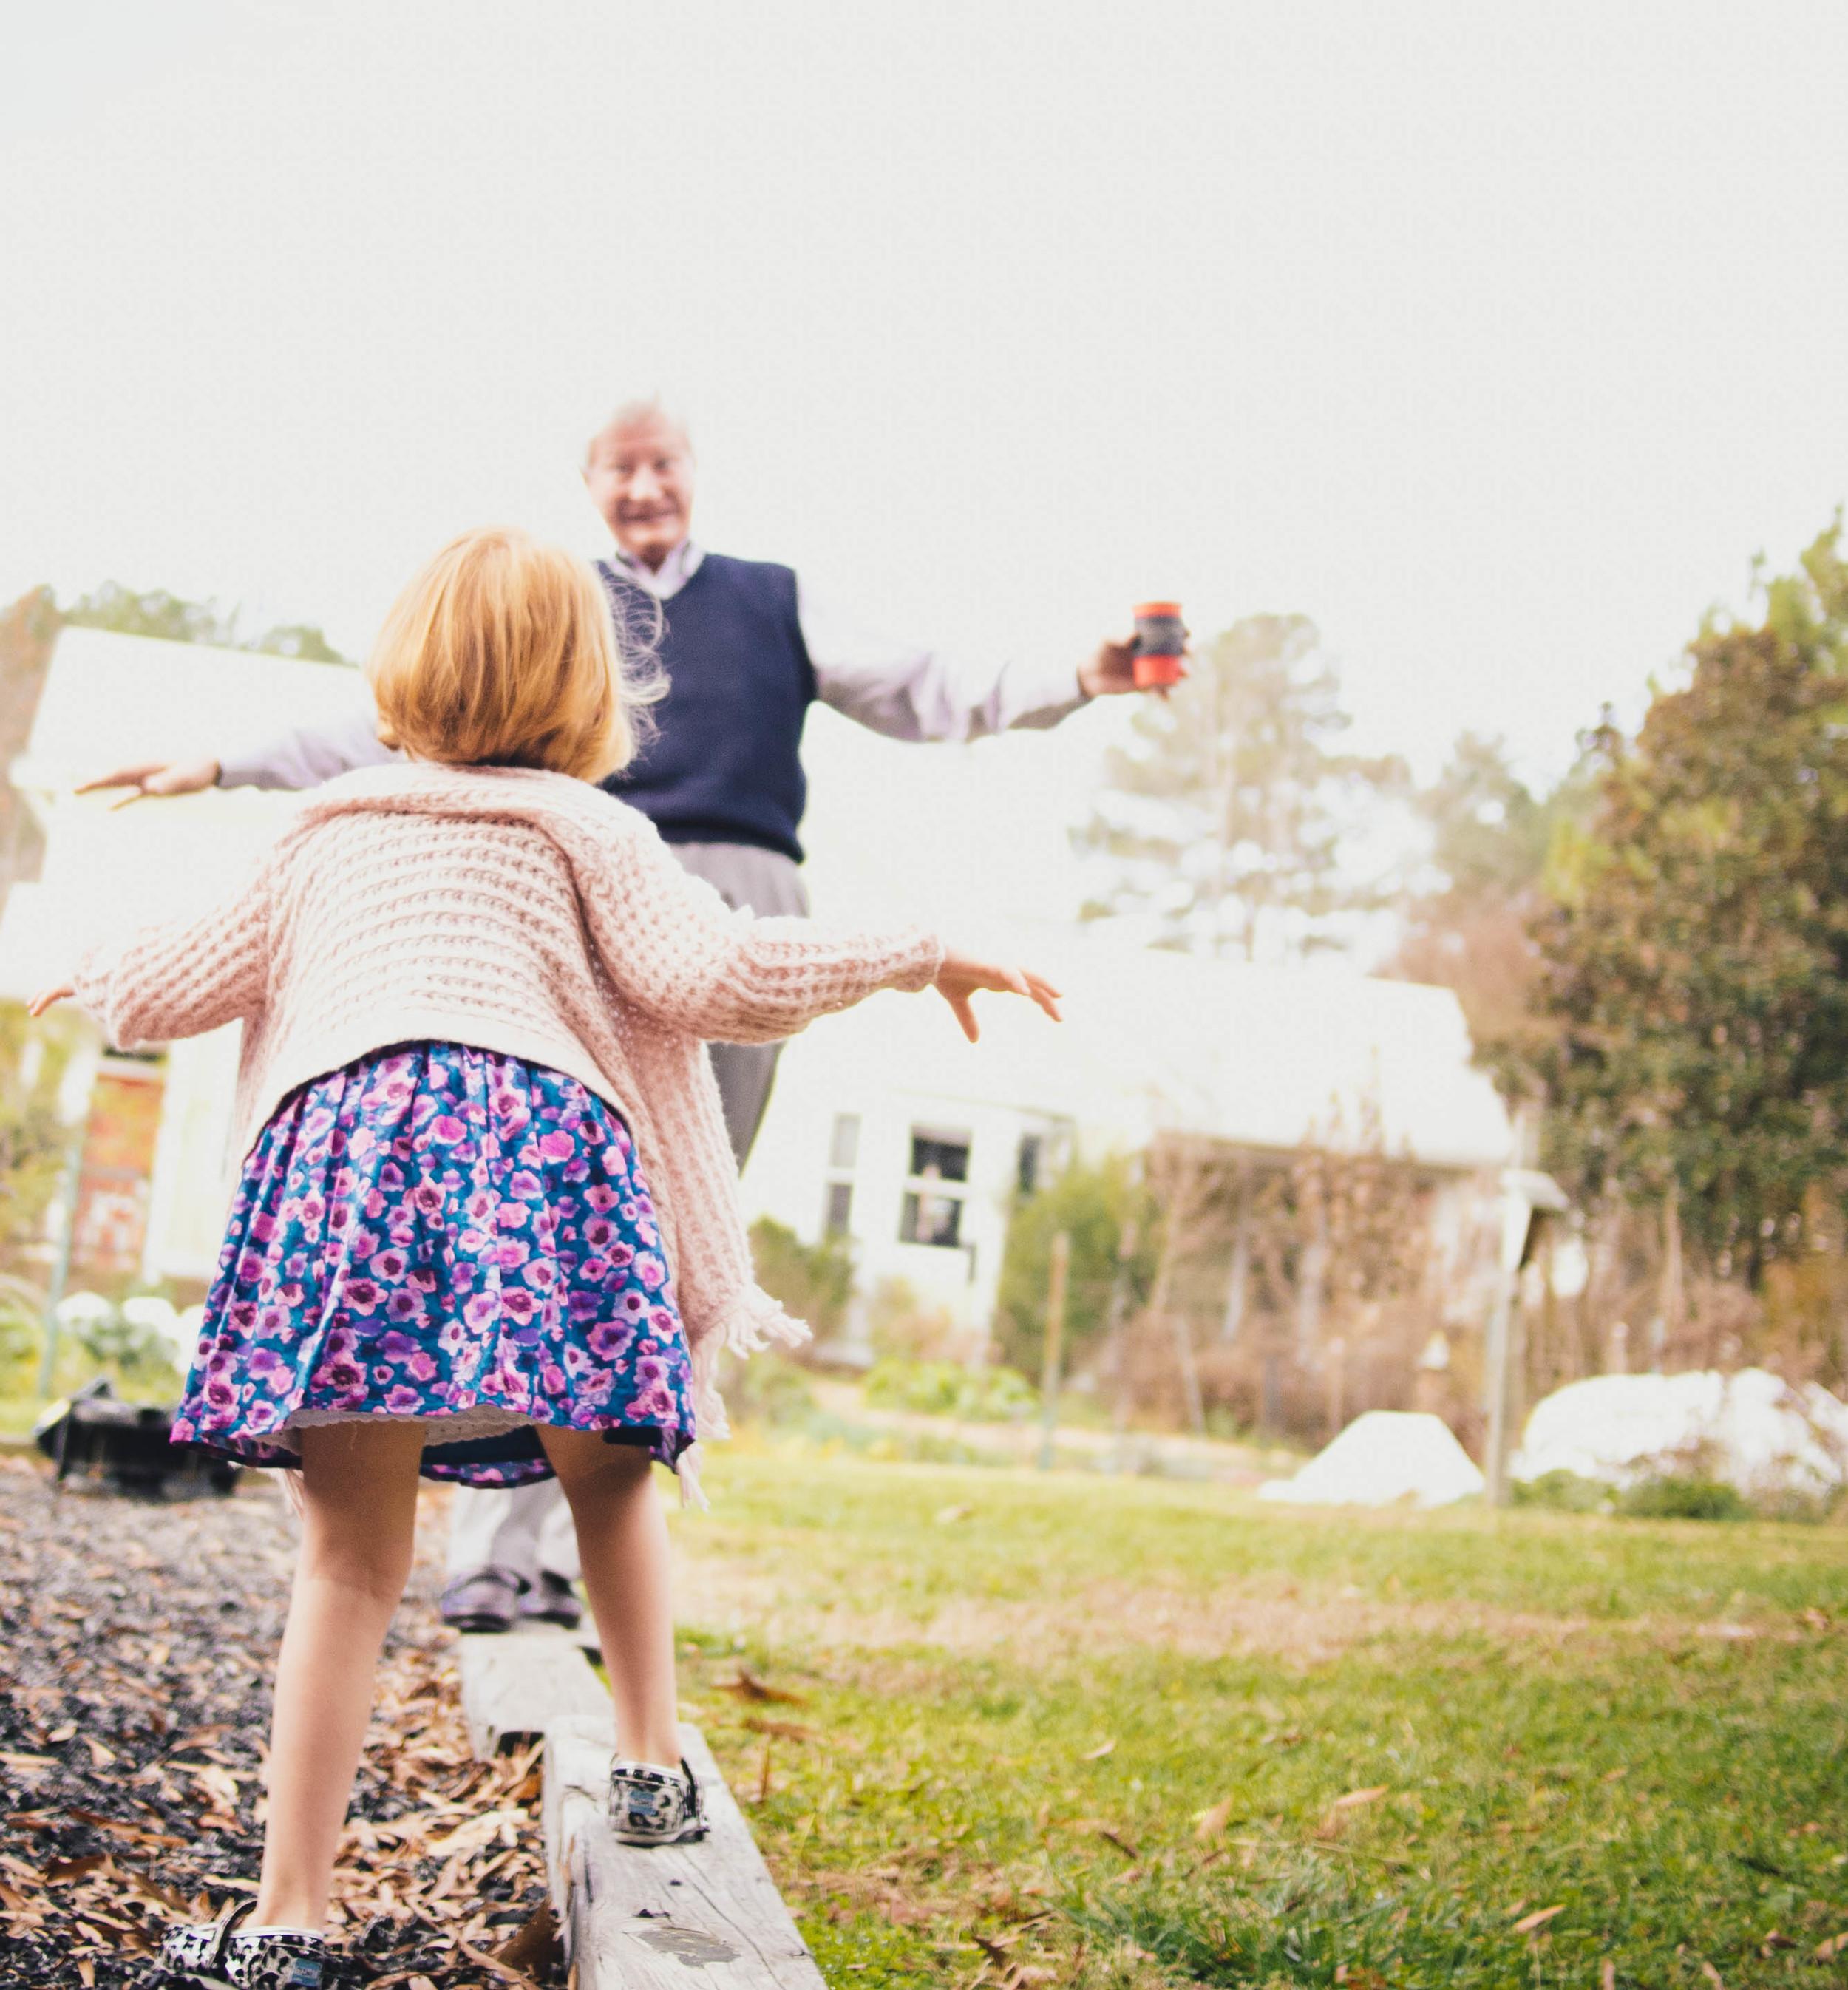 Family Portraits | Merritt Chesson Photography | Durham, NC